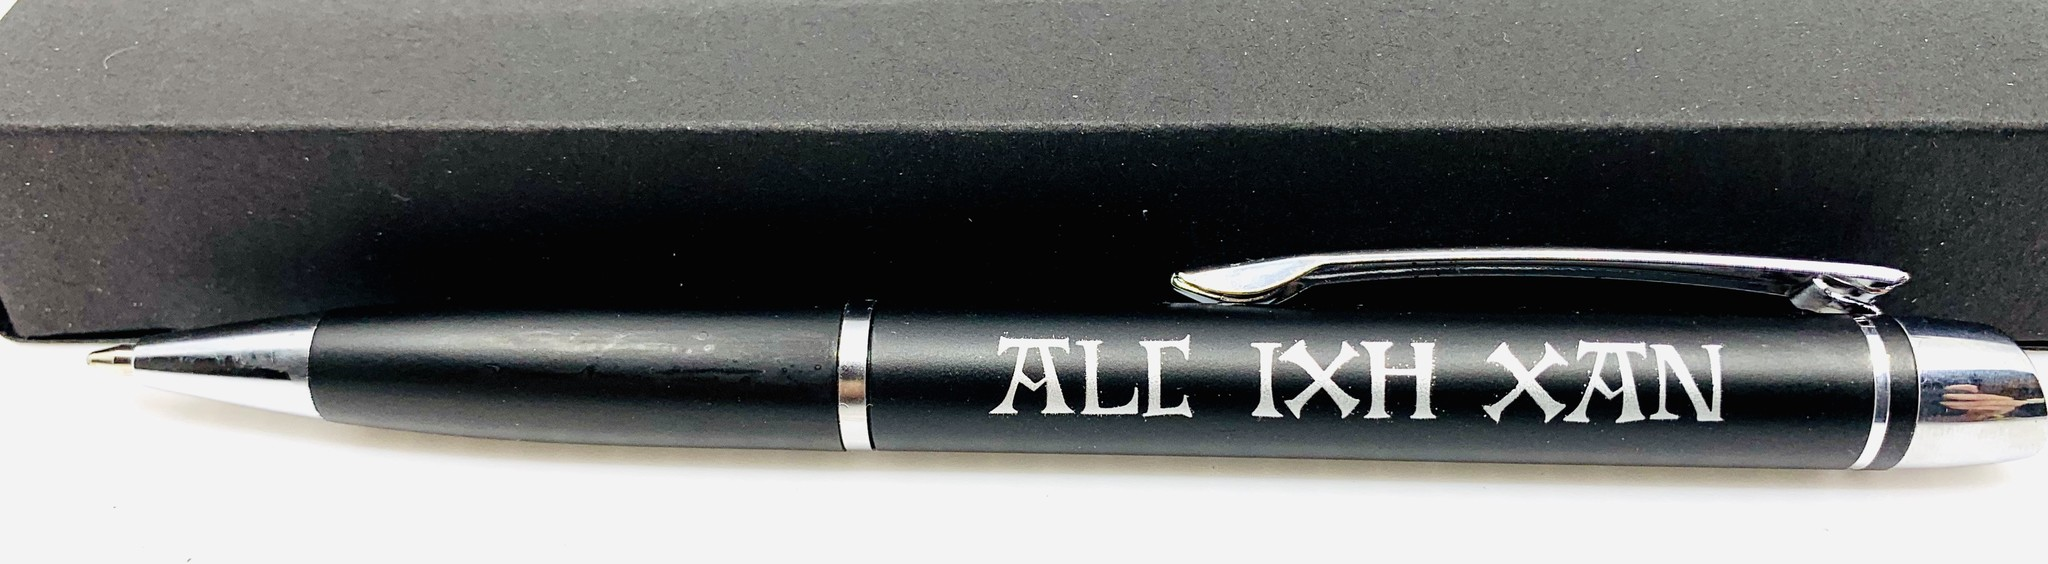 Van Eyck shop Balpen ALC IXH XAN - motto Jan Van Eyck